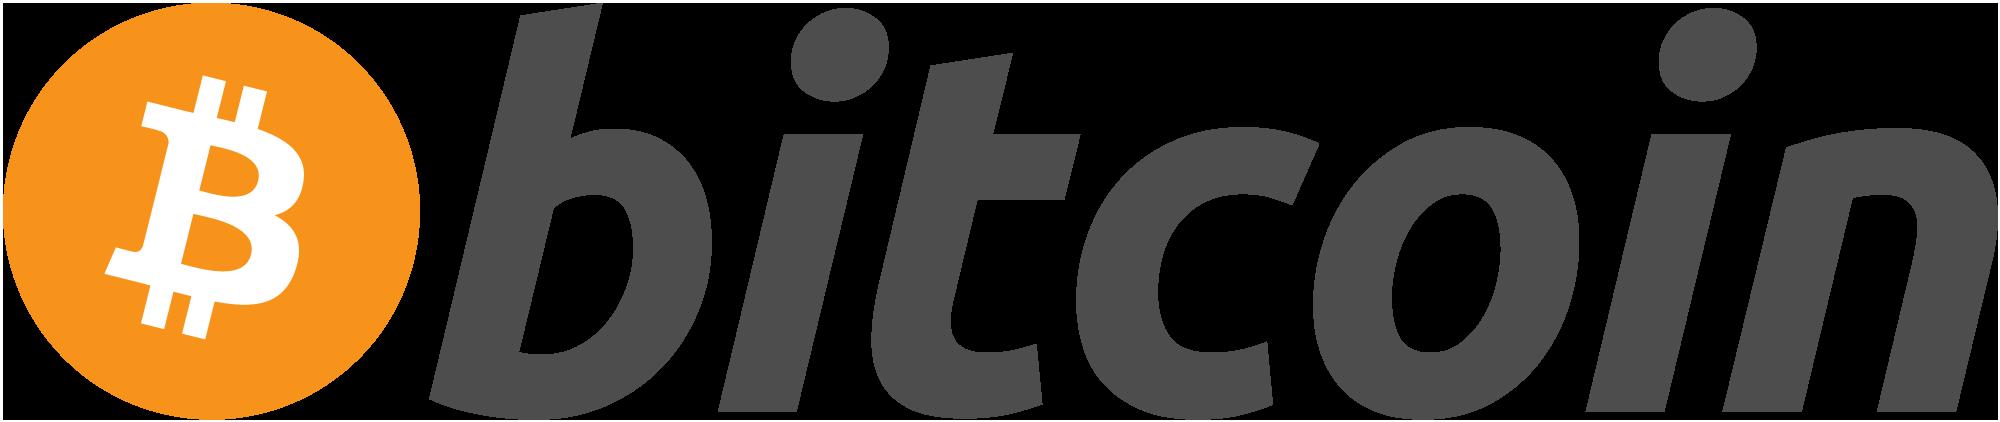 биткоин векторный (bitcoin vector)